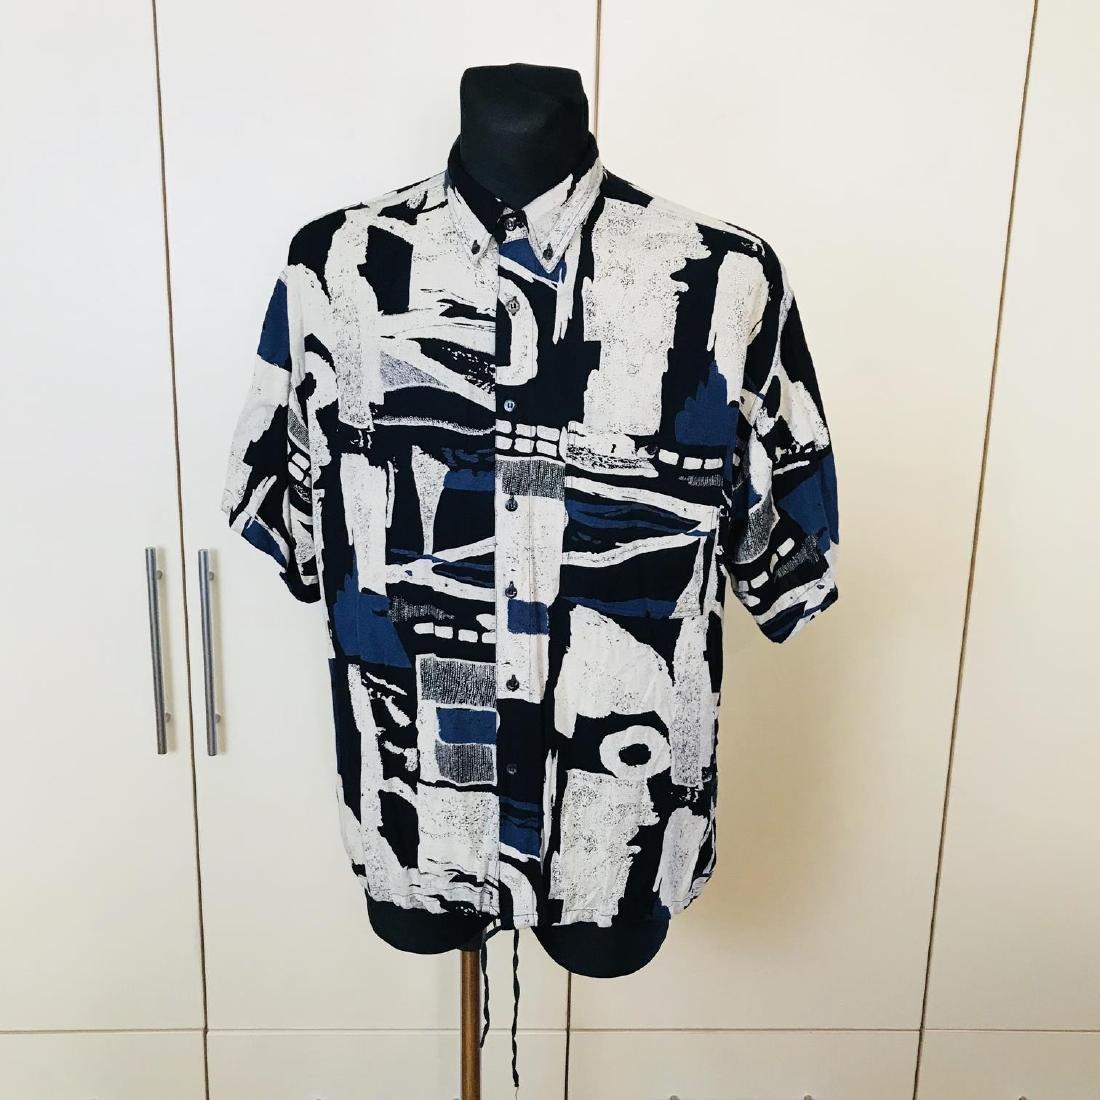 Vintage Men's DAYTON Hawaiian Shirt Top Size XL